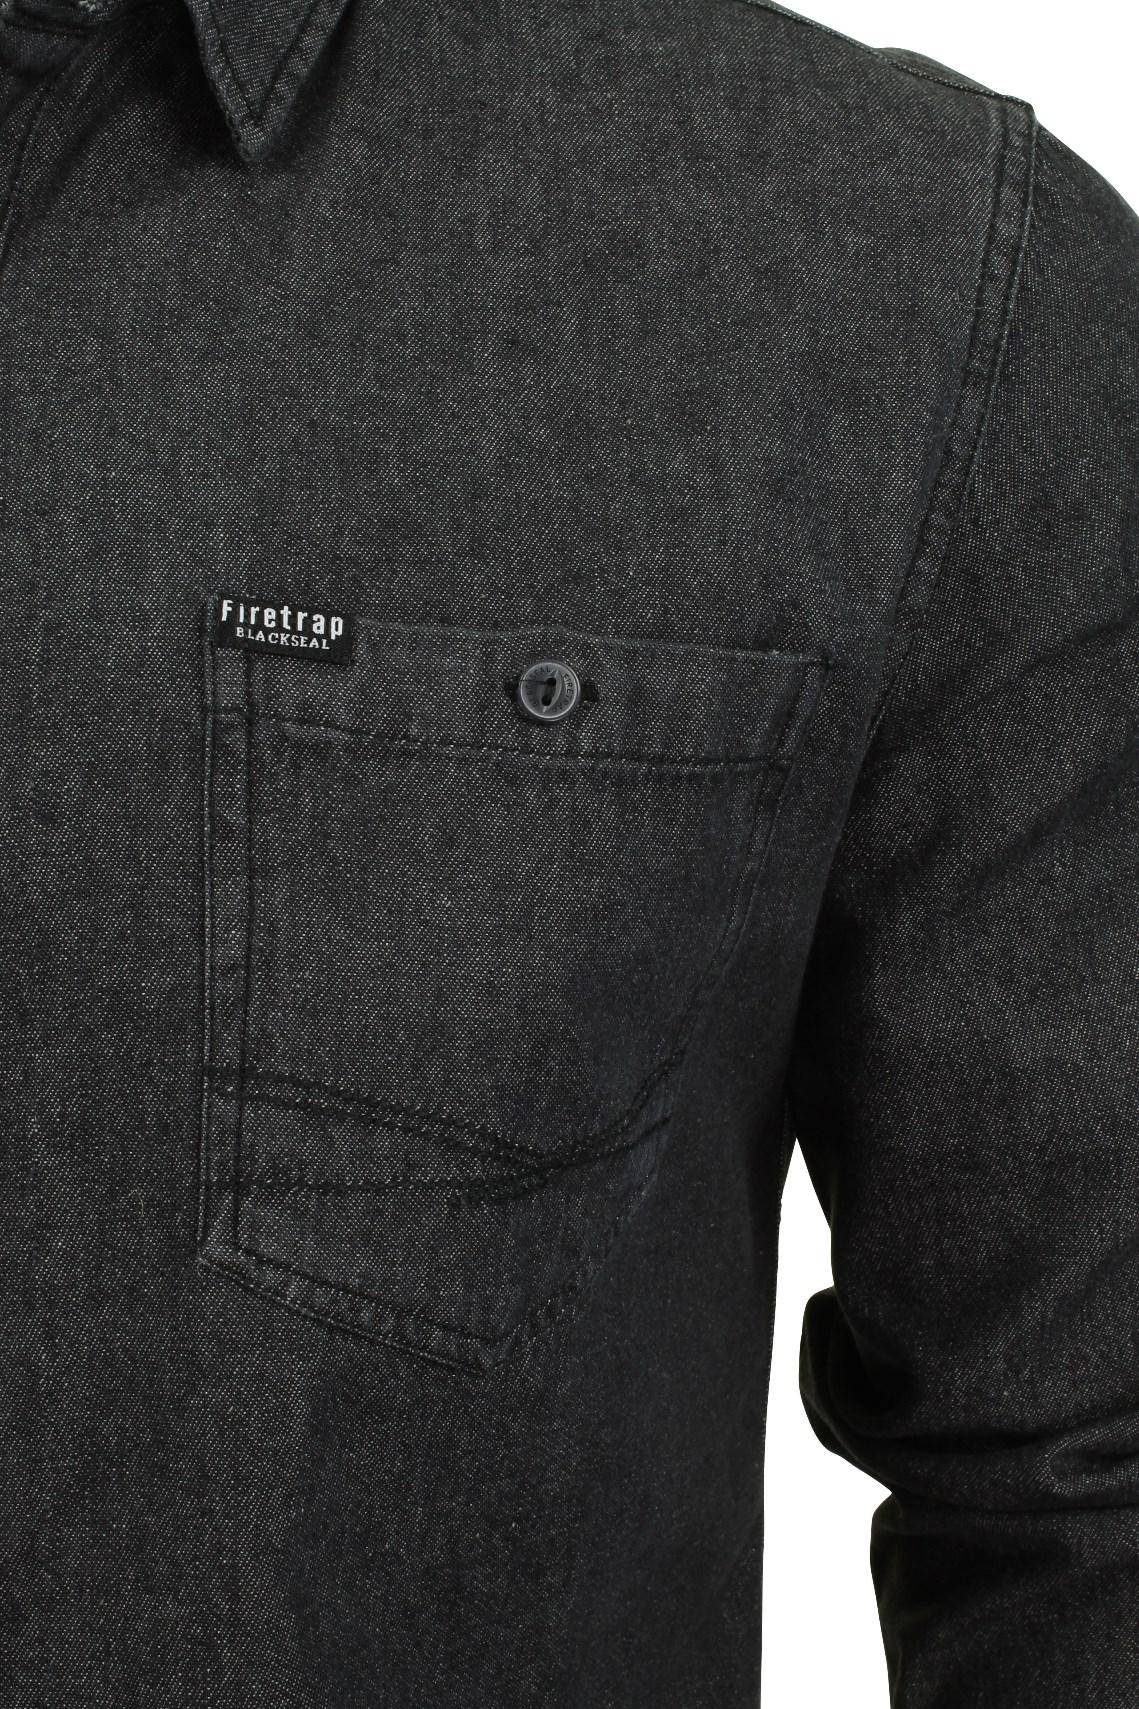 Para-Hombres-Camisa-De-Mezclilla-por-Firetrap-Western-Lavado-Vintage-Manga-Larga miniatura 15